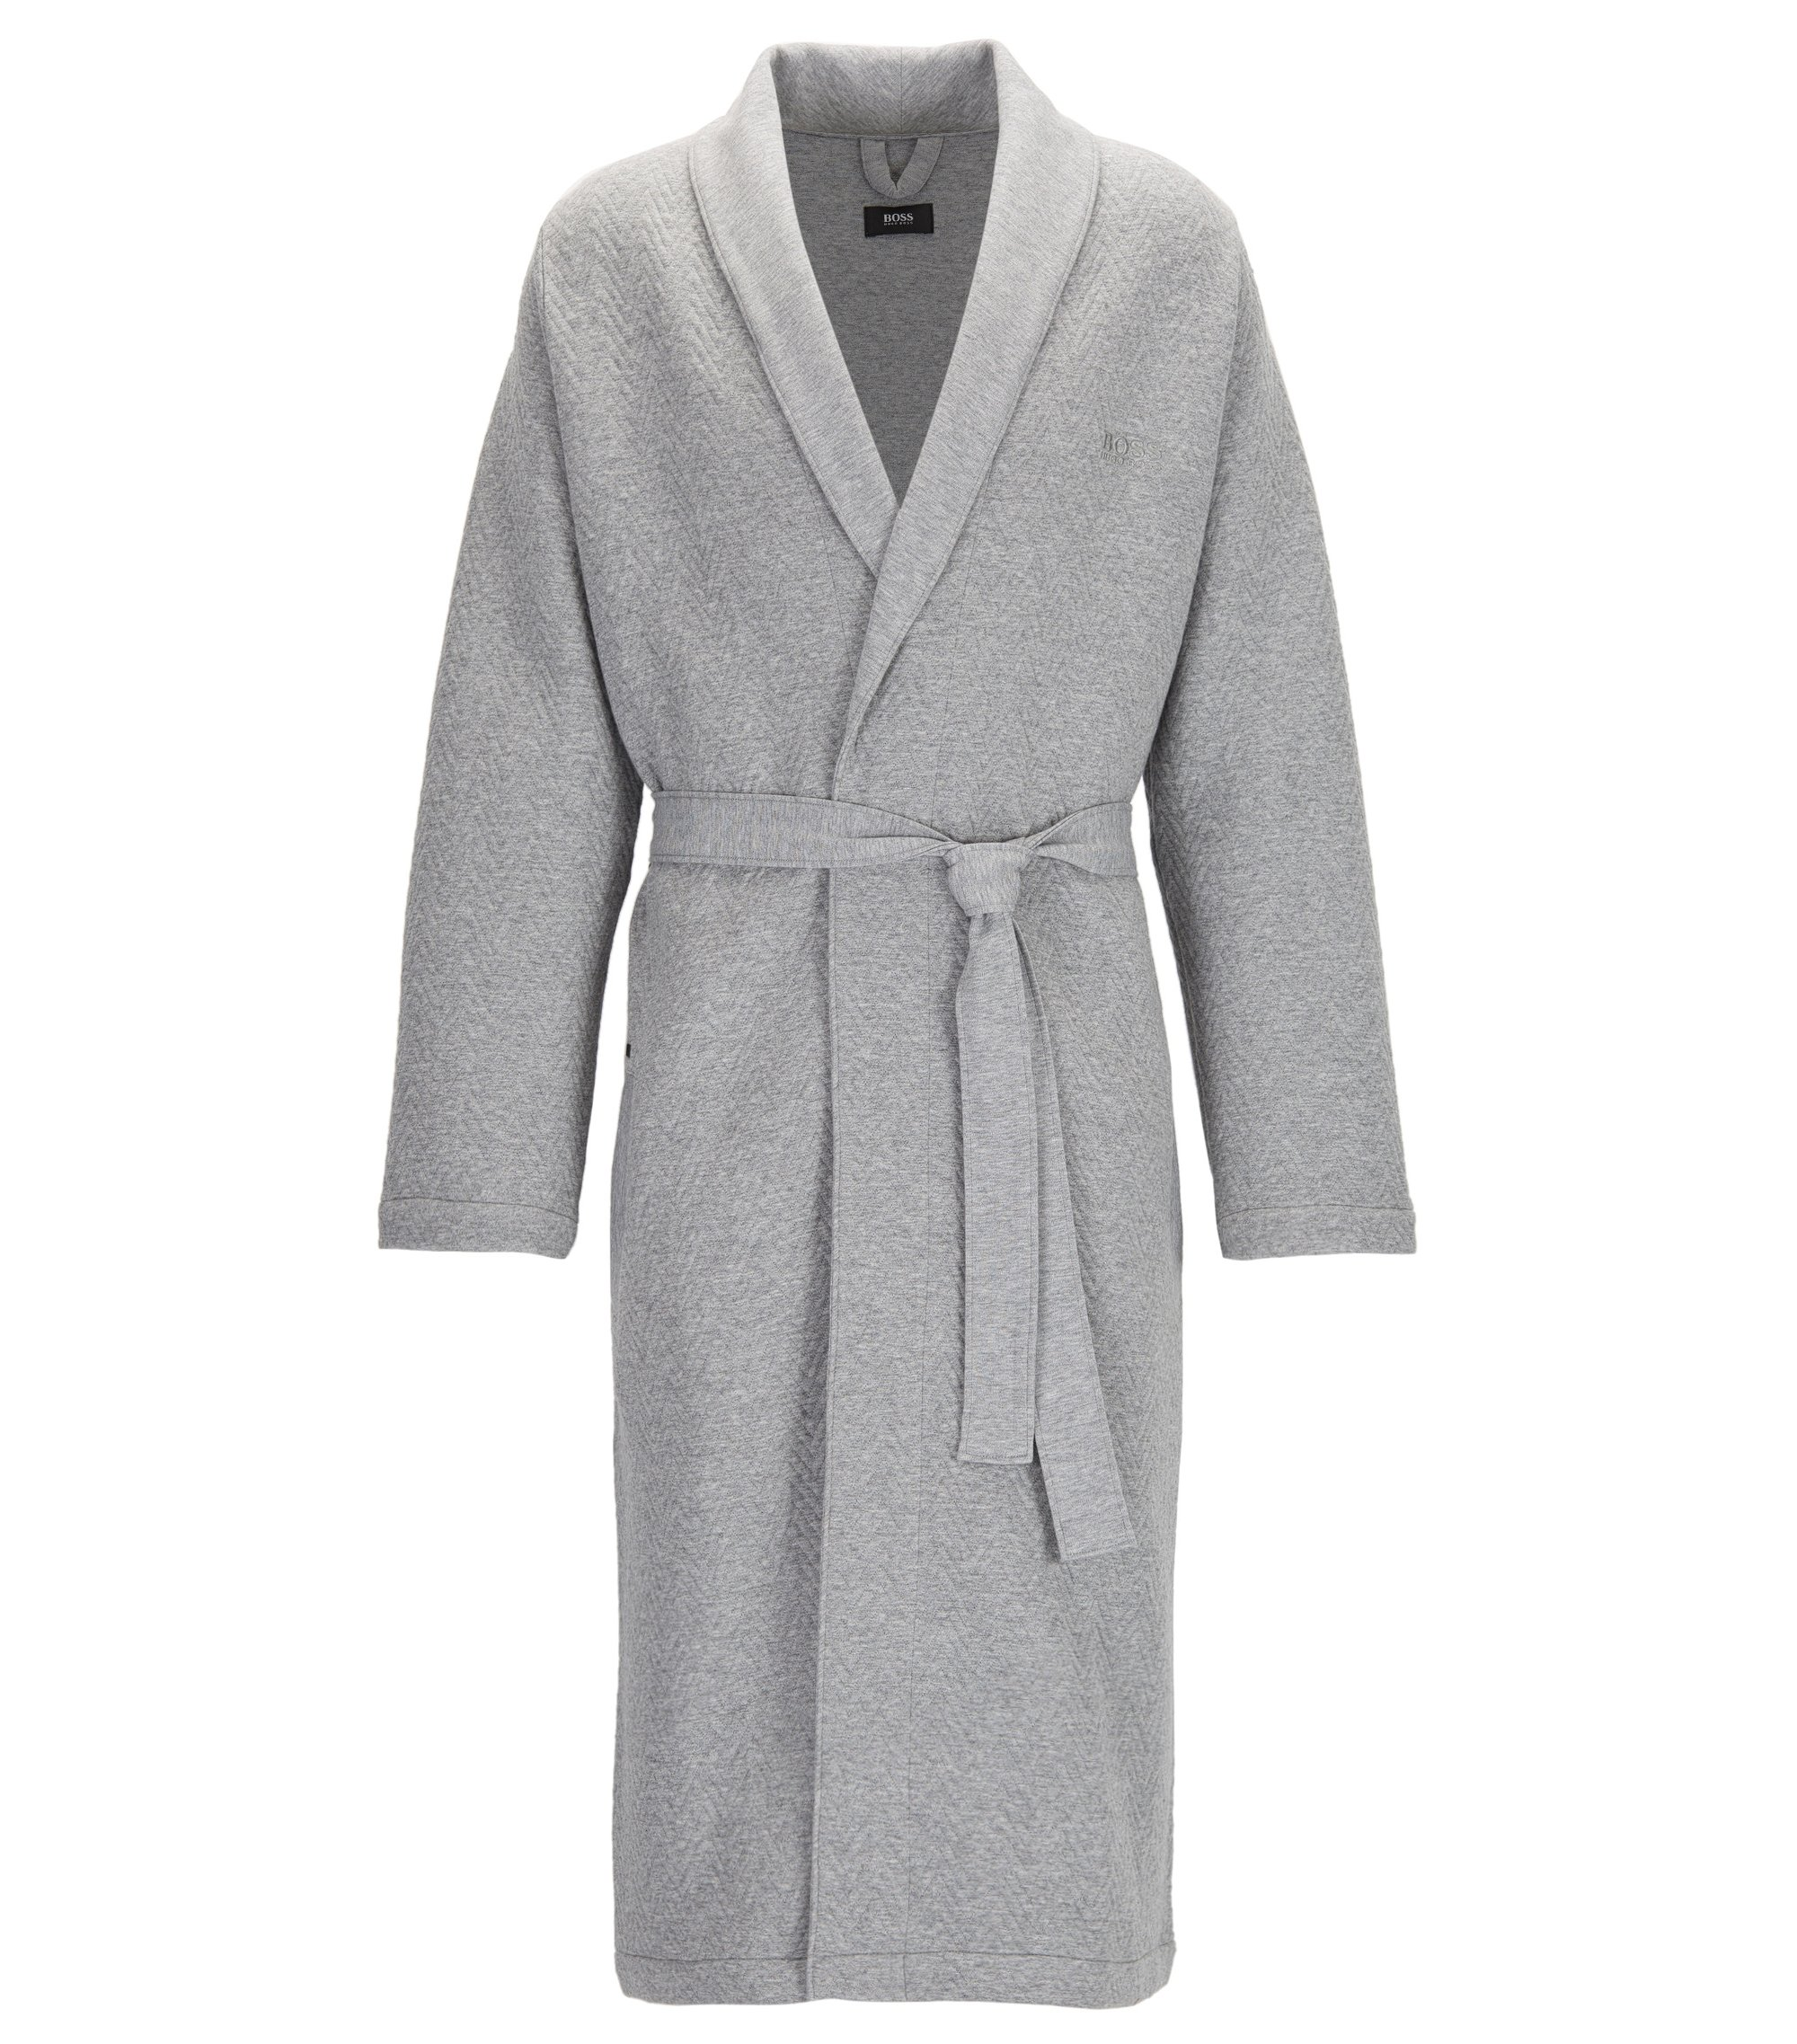 Herringbone-Knit Cotton Robe | Contemporary Robe, Grey